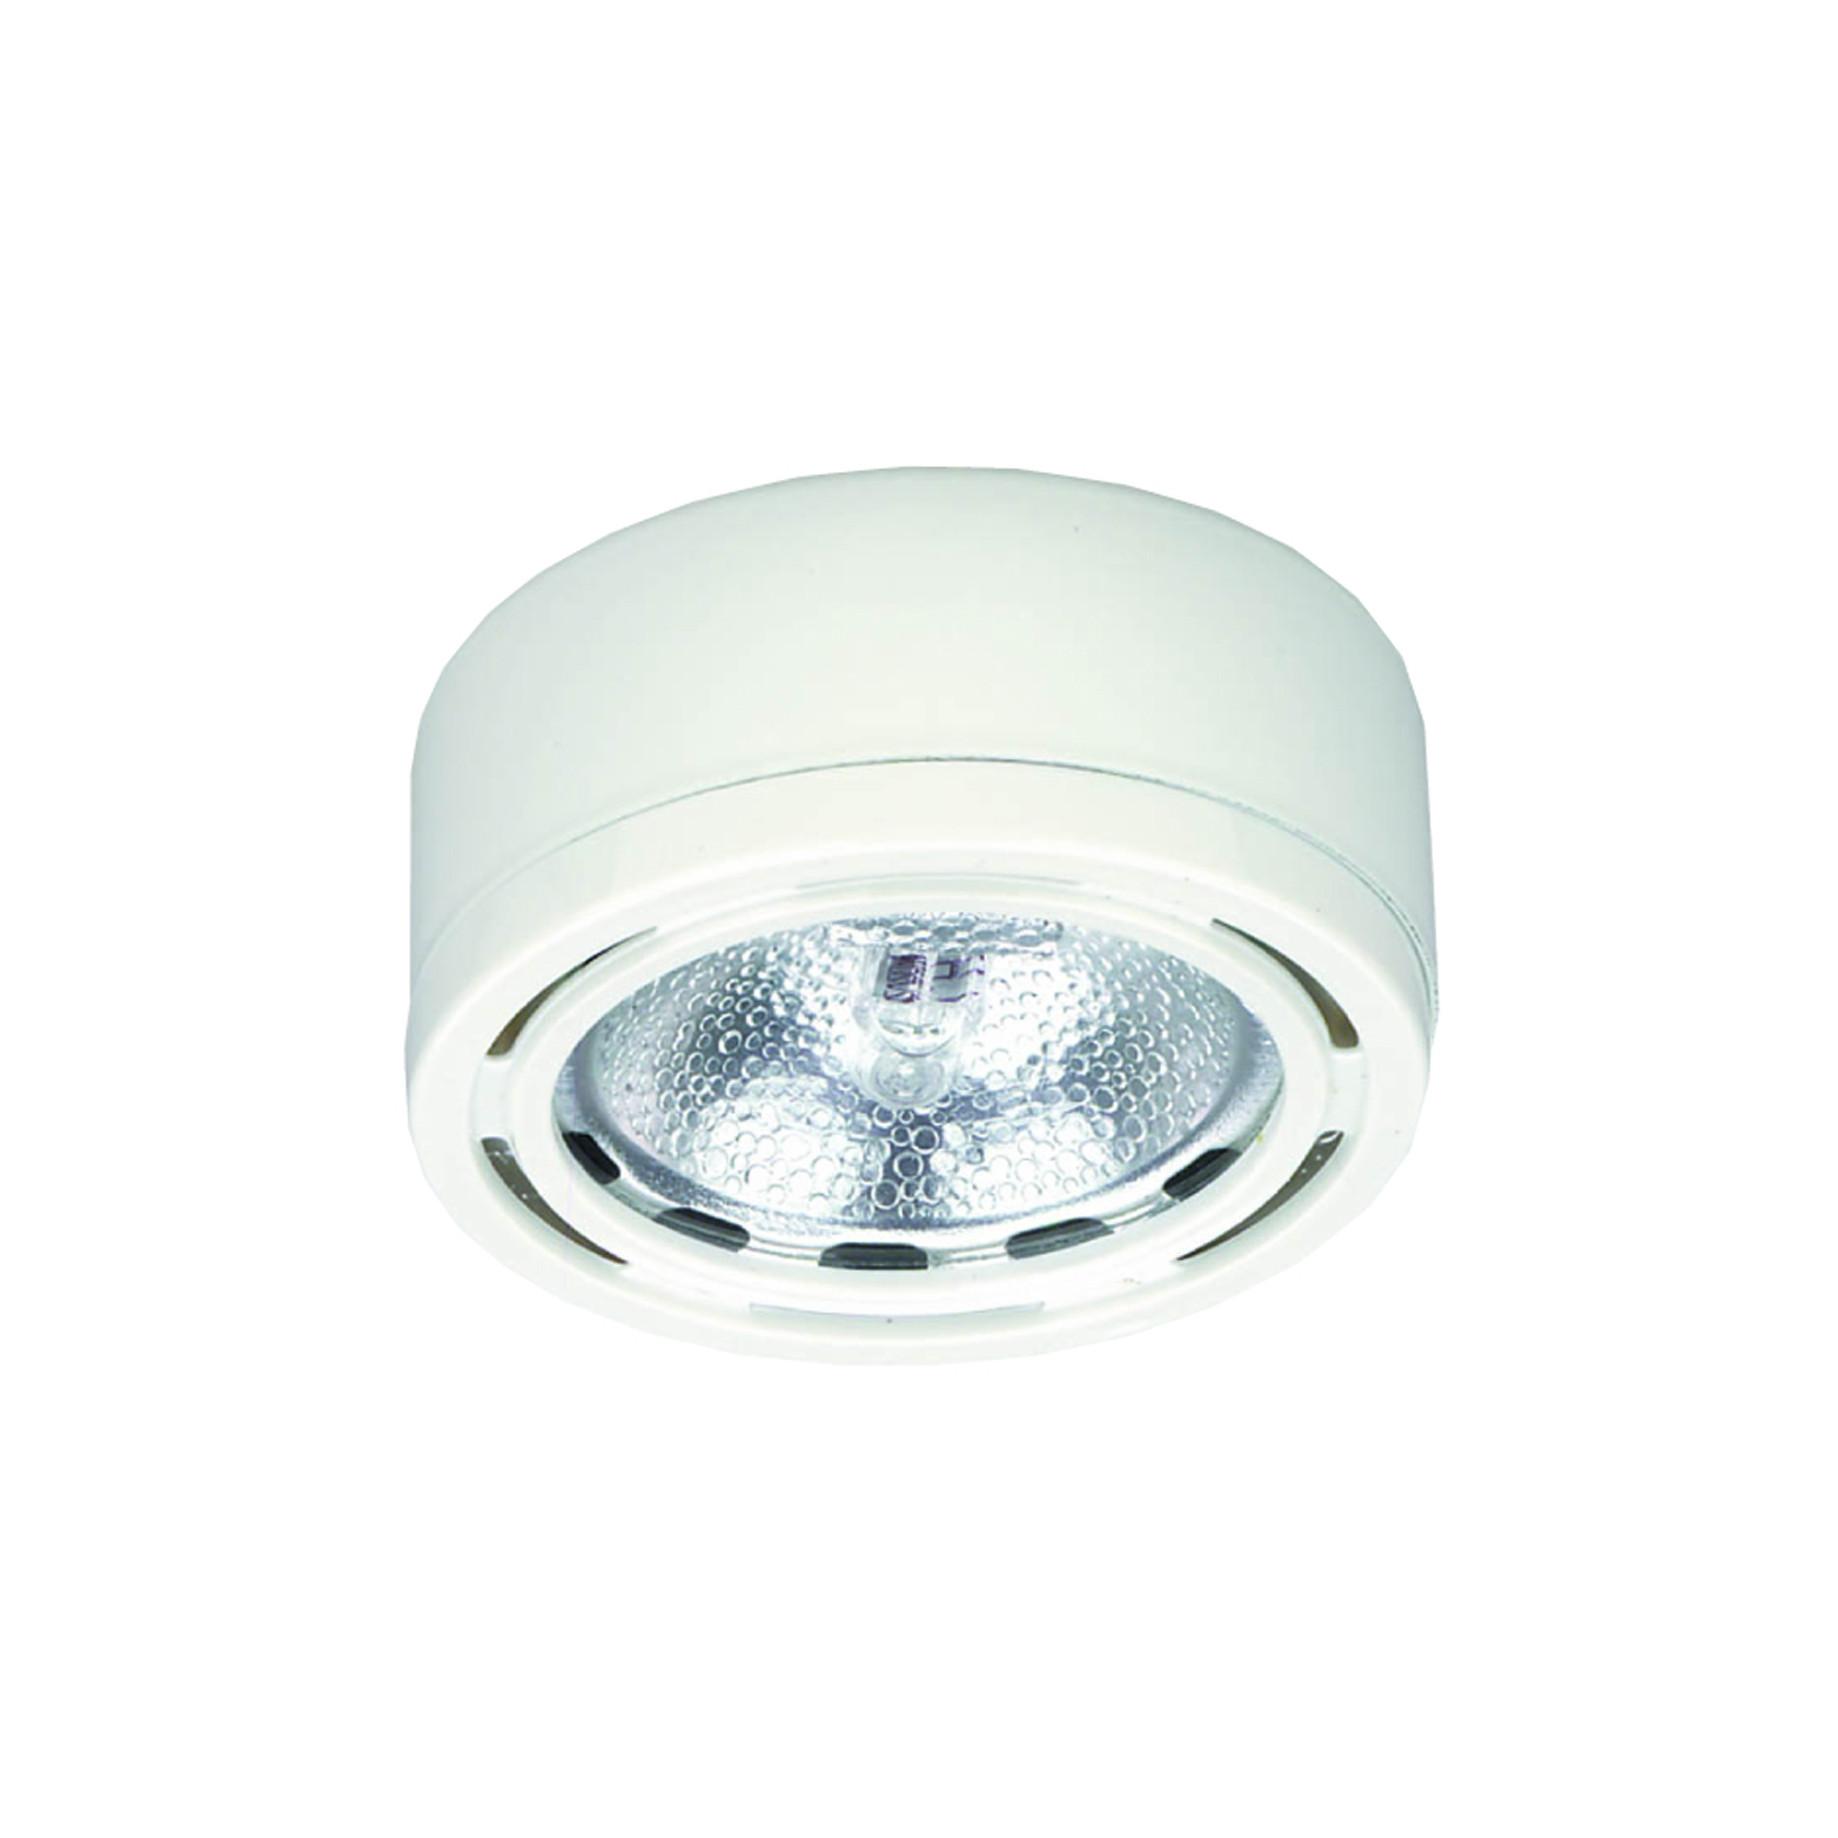 Liton l126 2 mini reflector w lamp downloads aloadofball Image collections